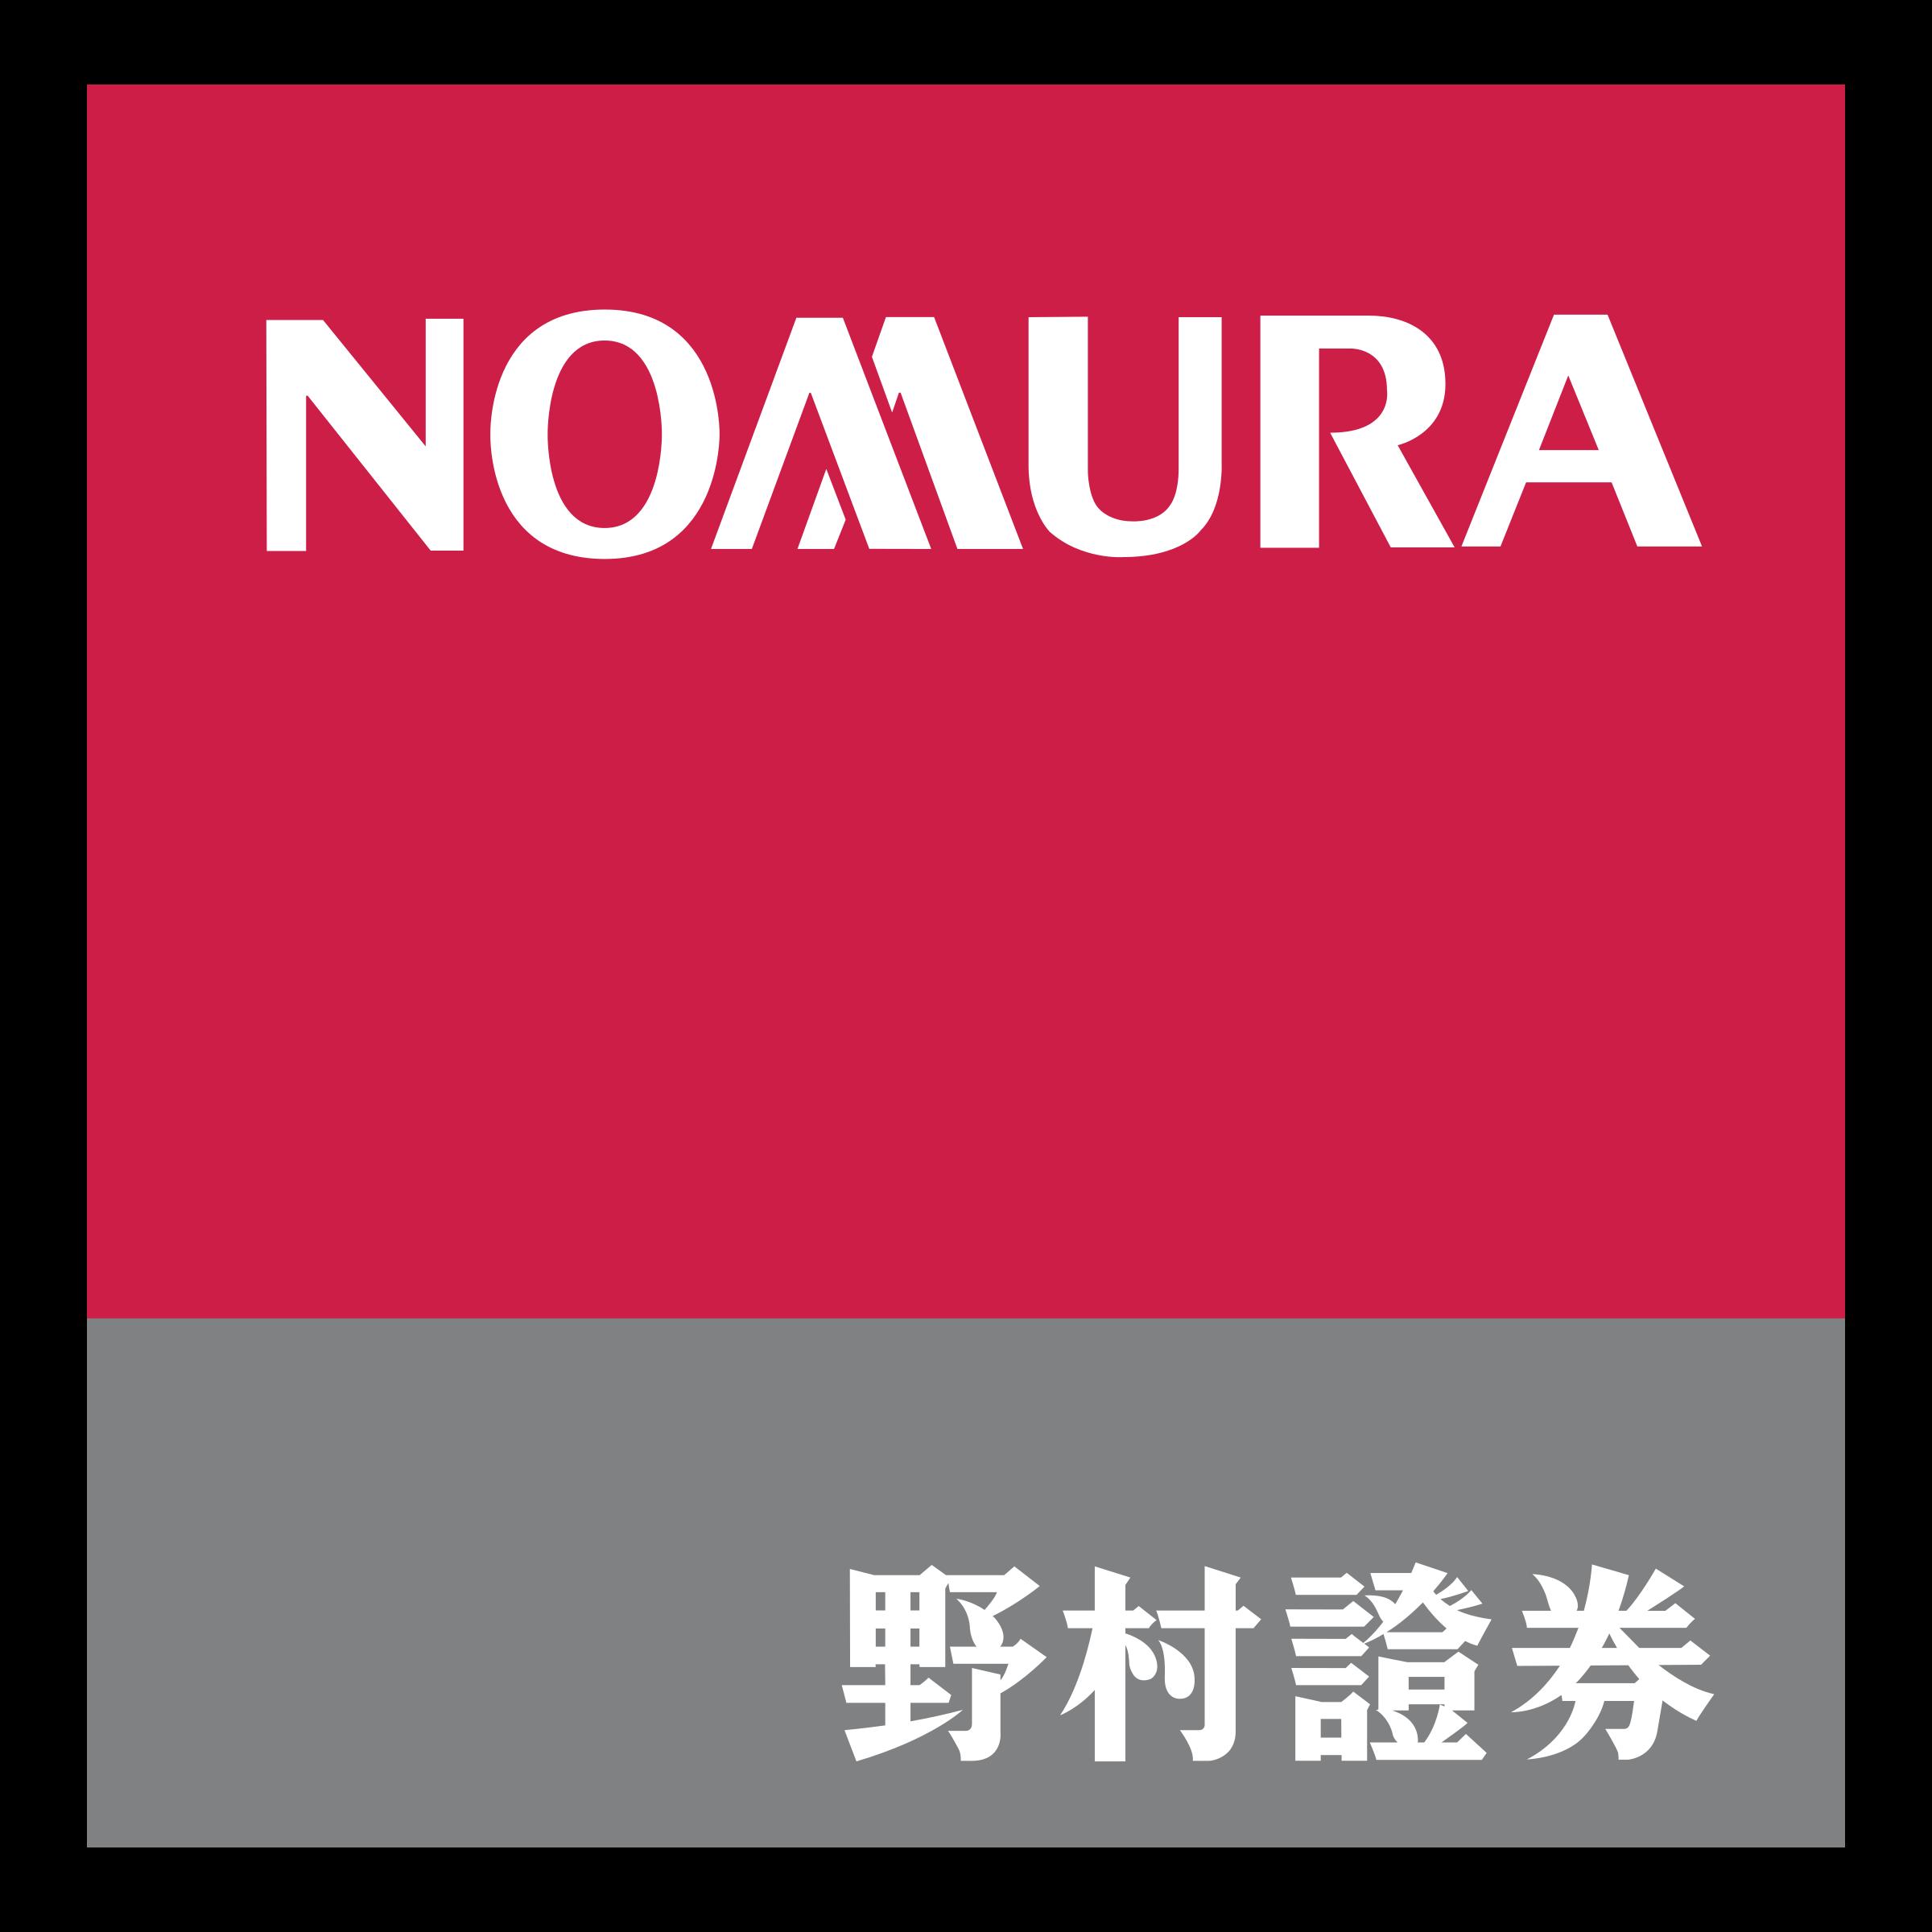 Nomura Logo PNG Transparent & SVG Vector.